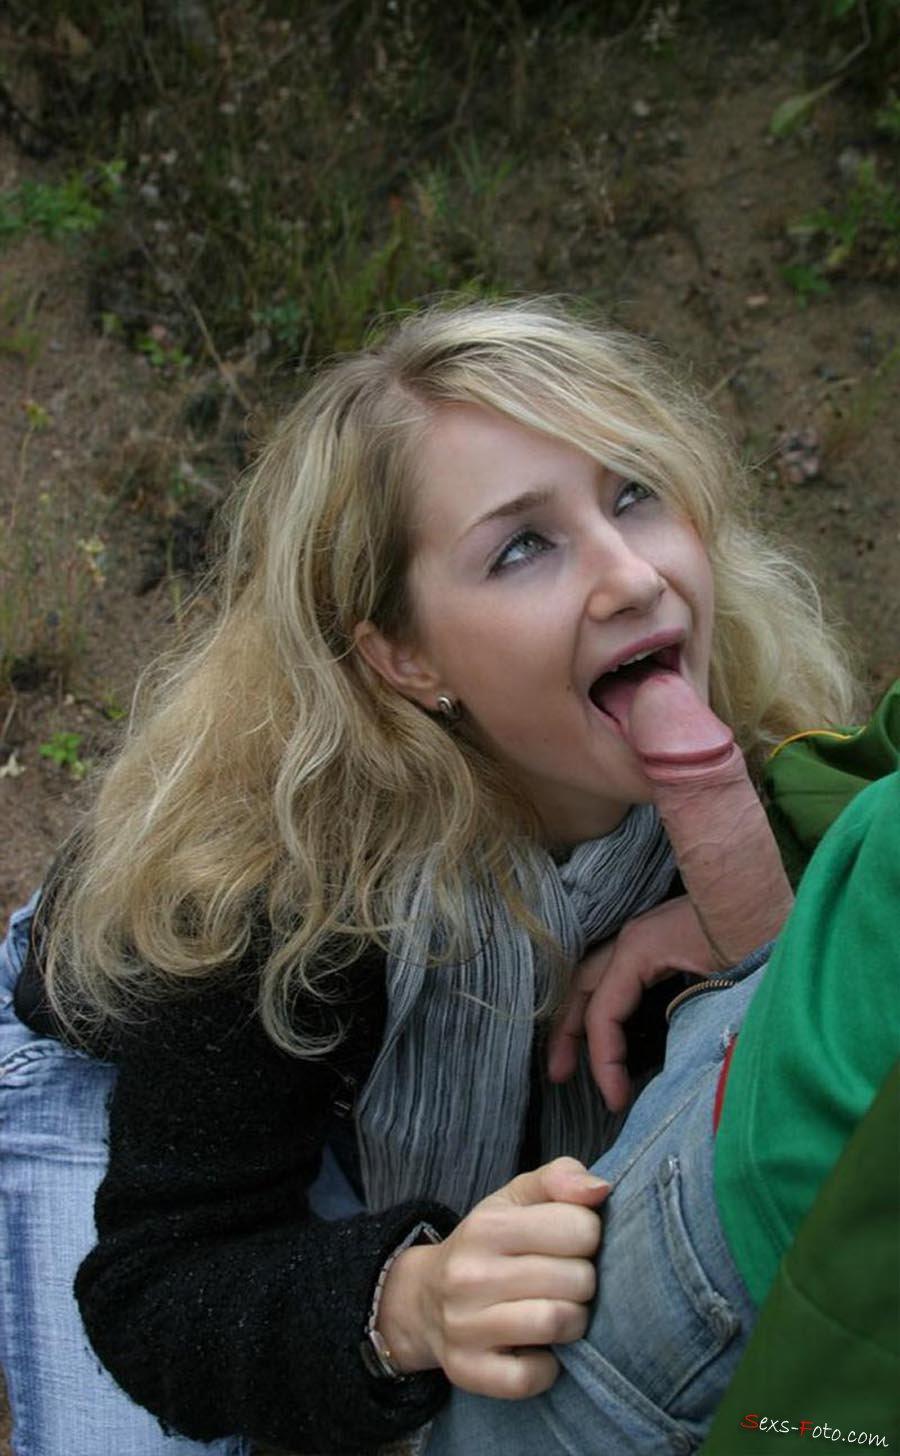 свежие фотографии девушка сосет член на улице жалели